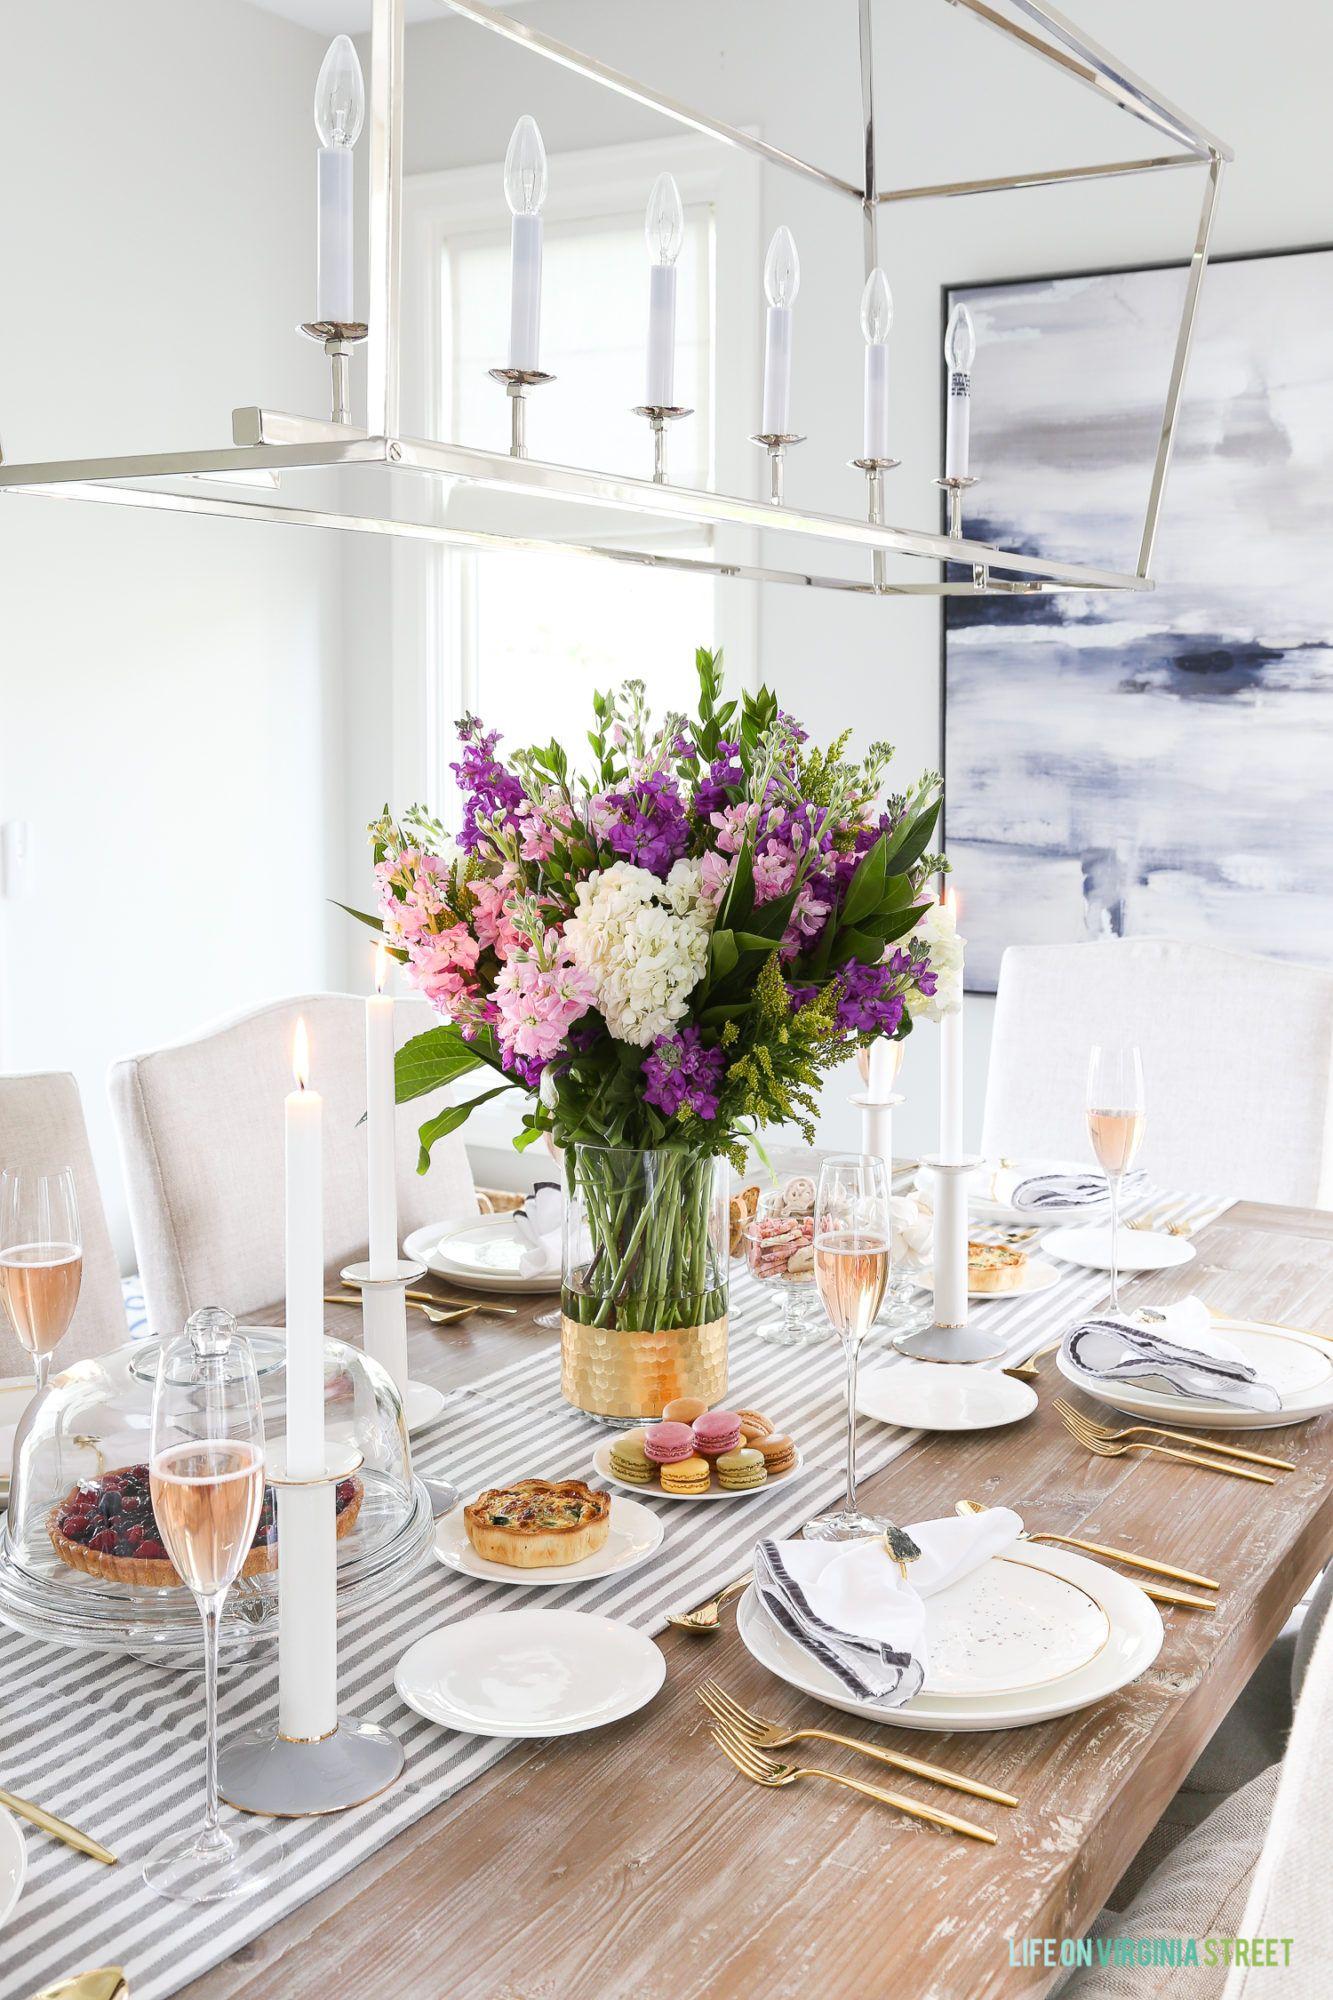 A Gorgeous Formal Brunch Tablescape, Showcasing Just How Versatile The